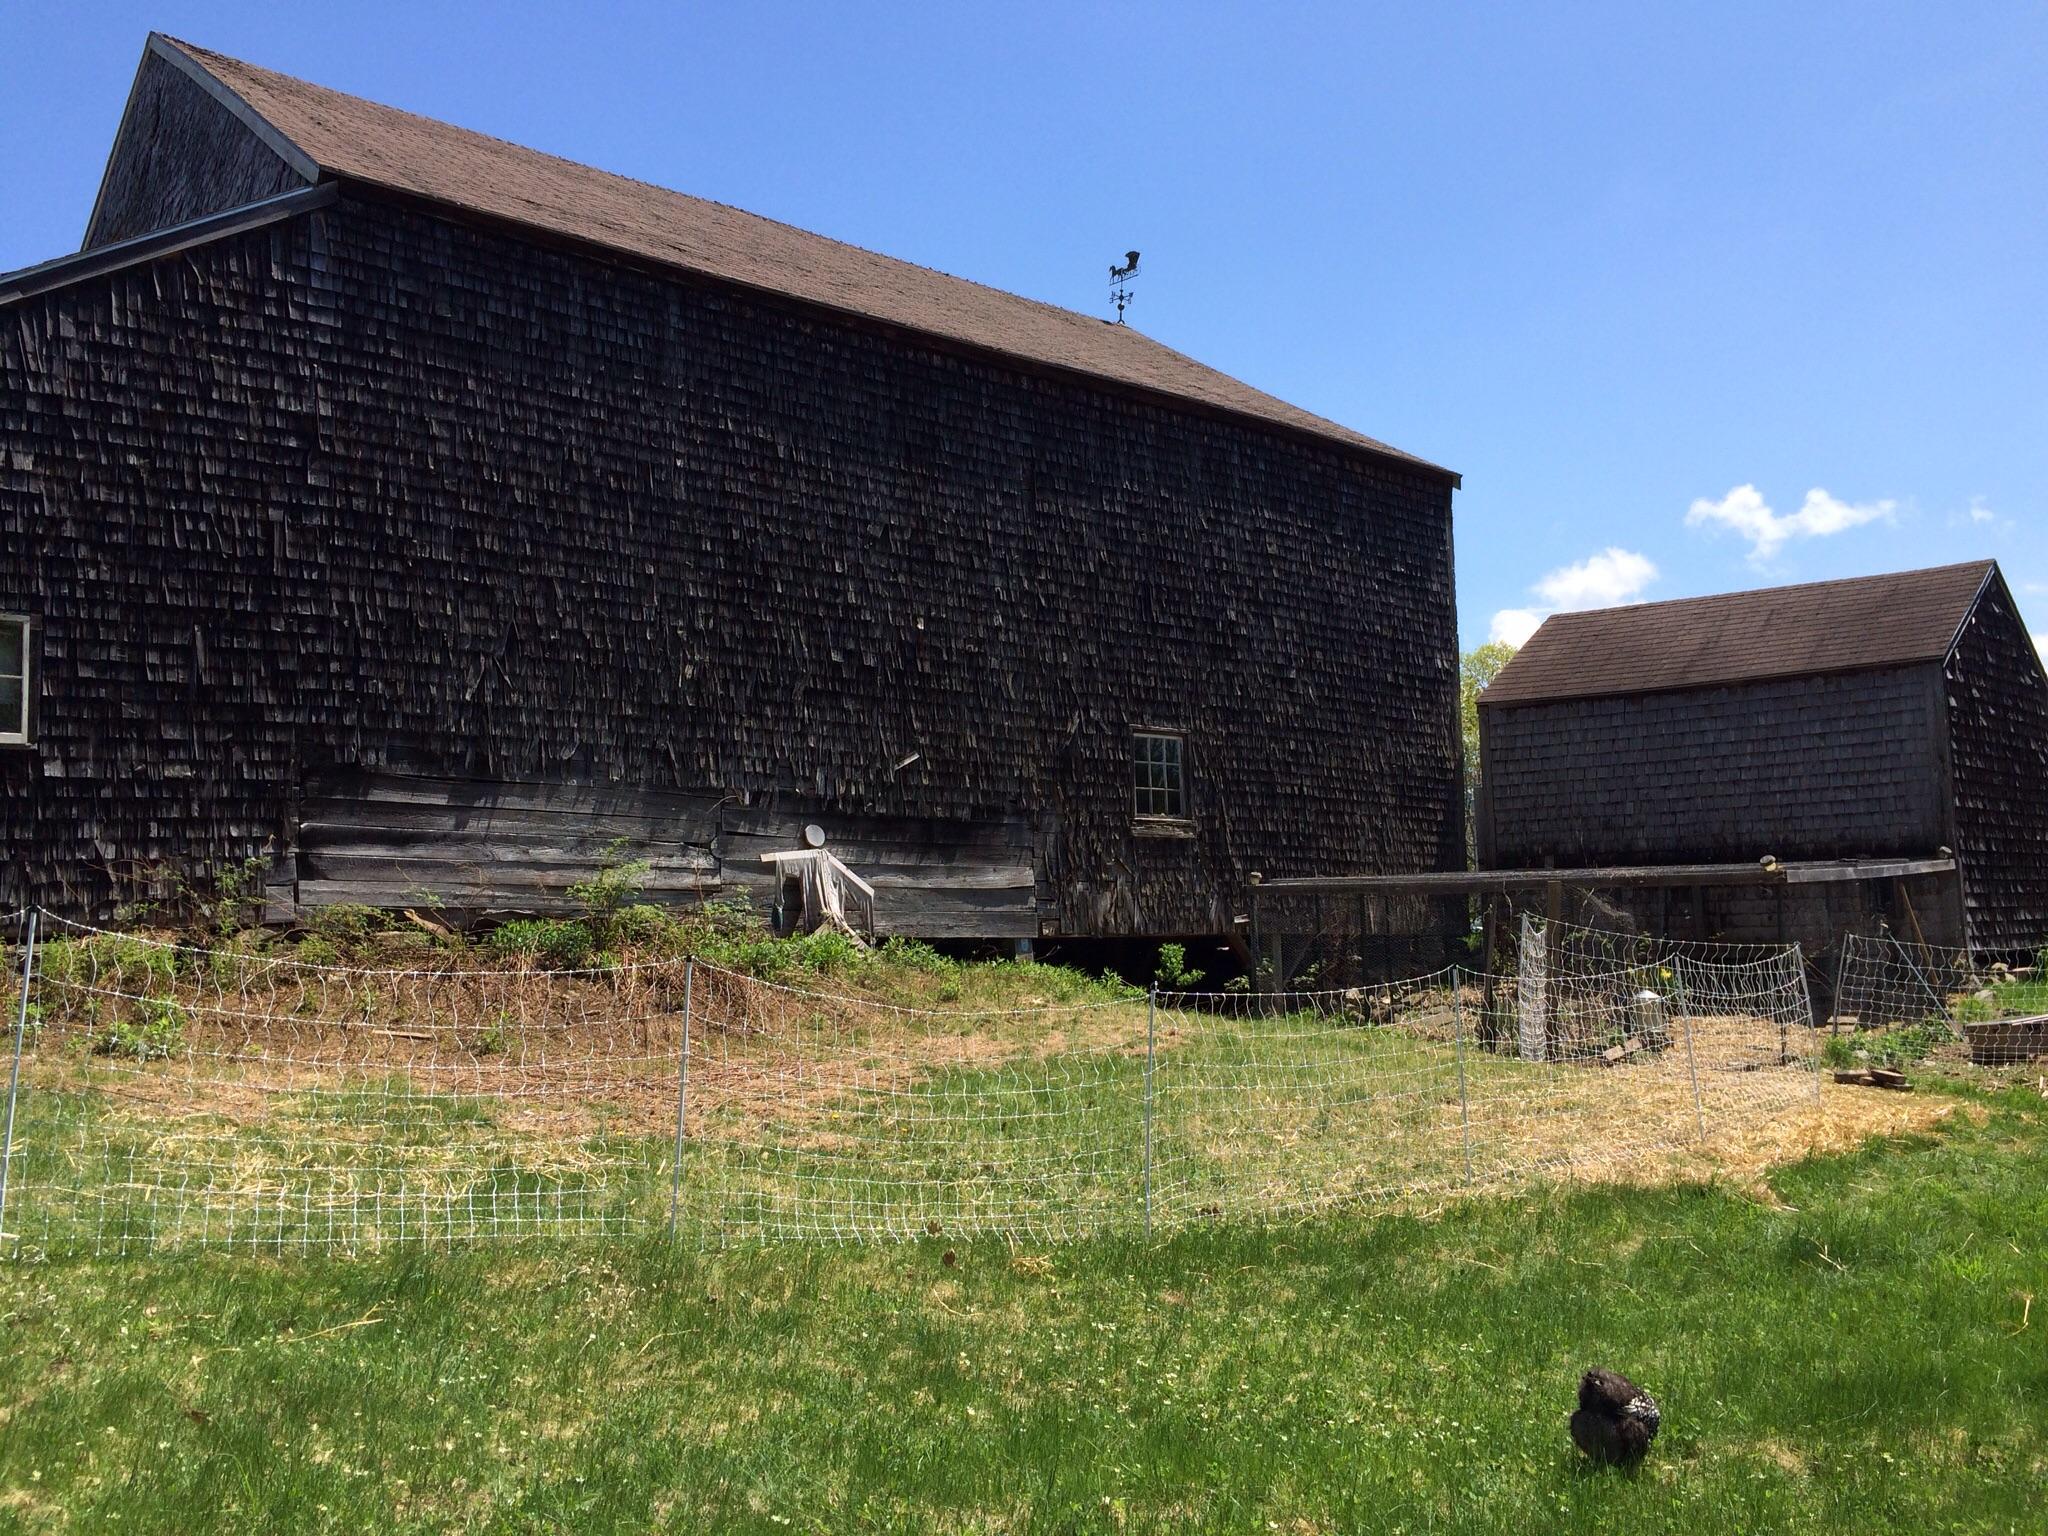 One small chicken. One big barn